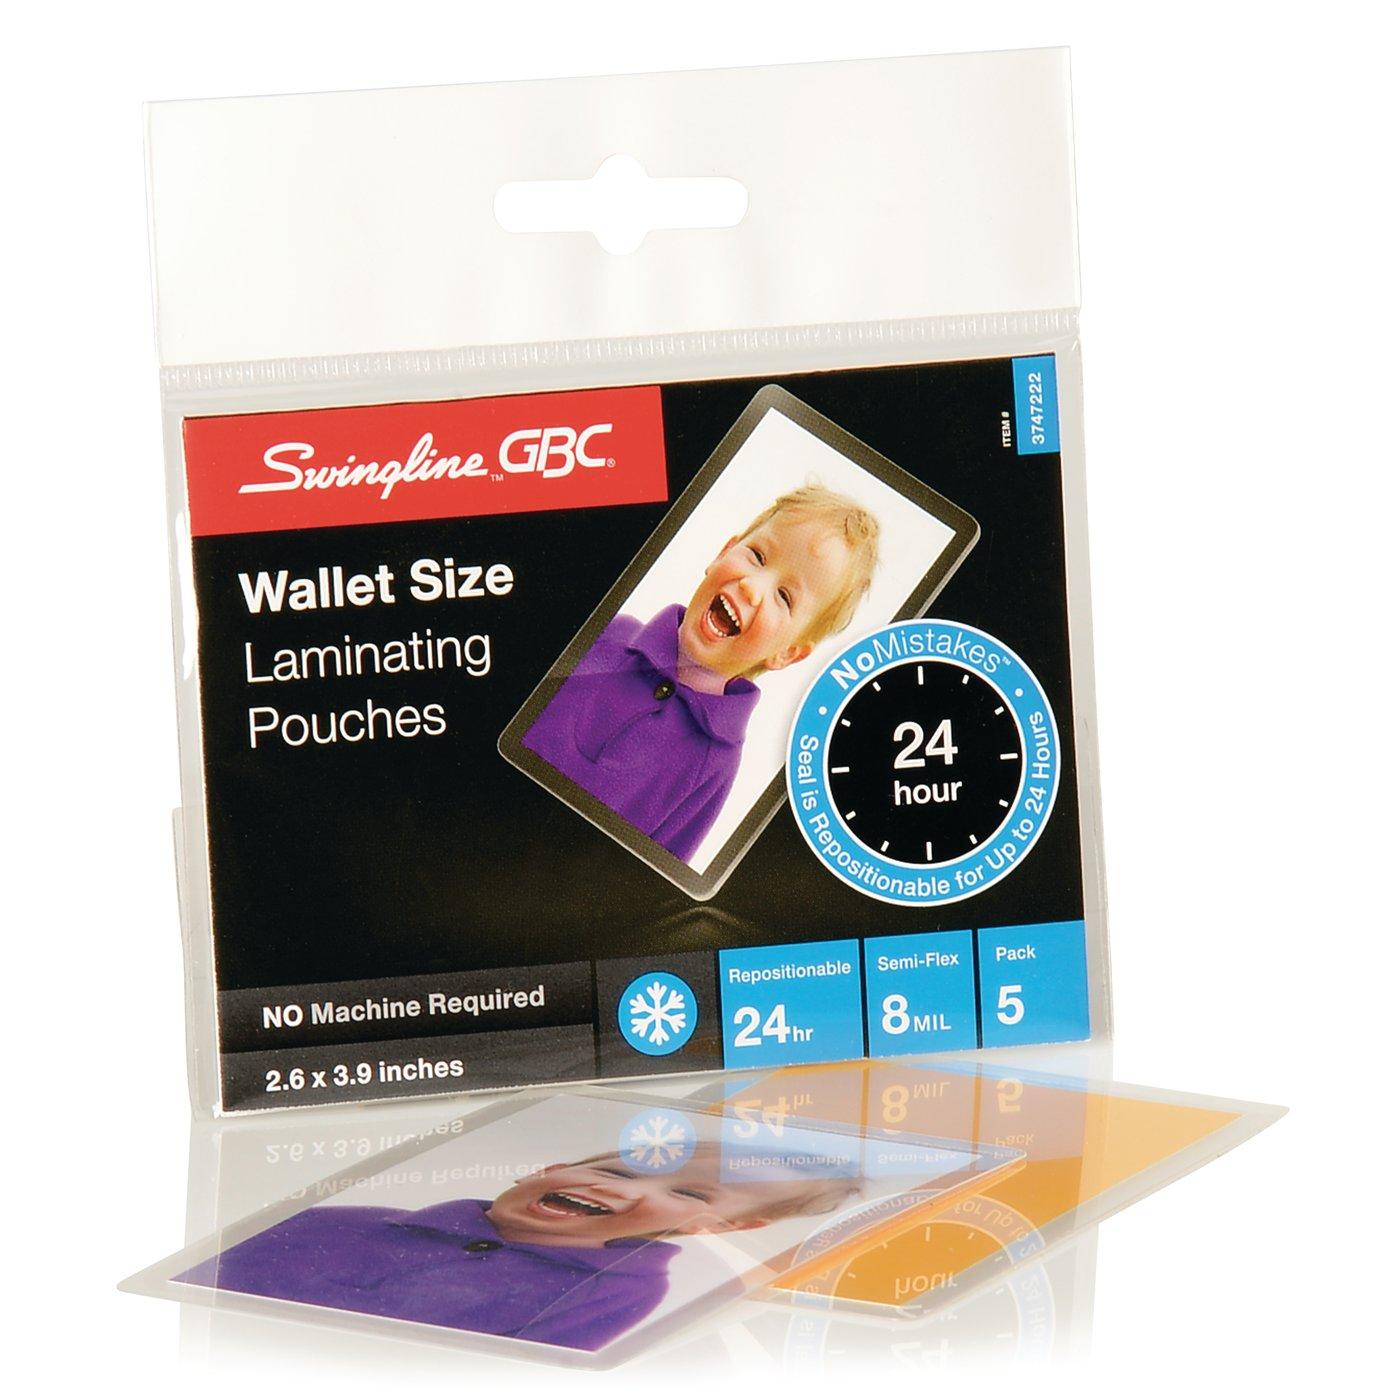 Swingline - Laminators - Cold Lamination Supplies - Swingline GBC ...